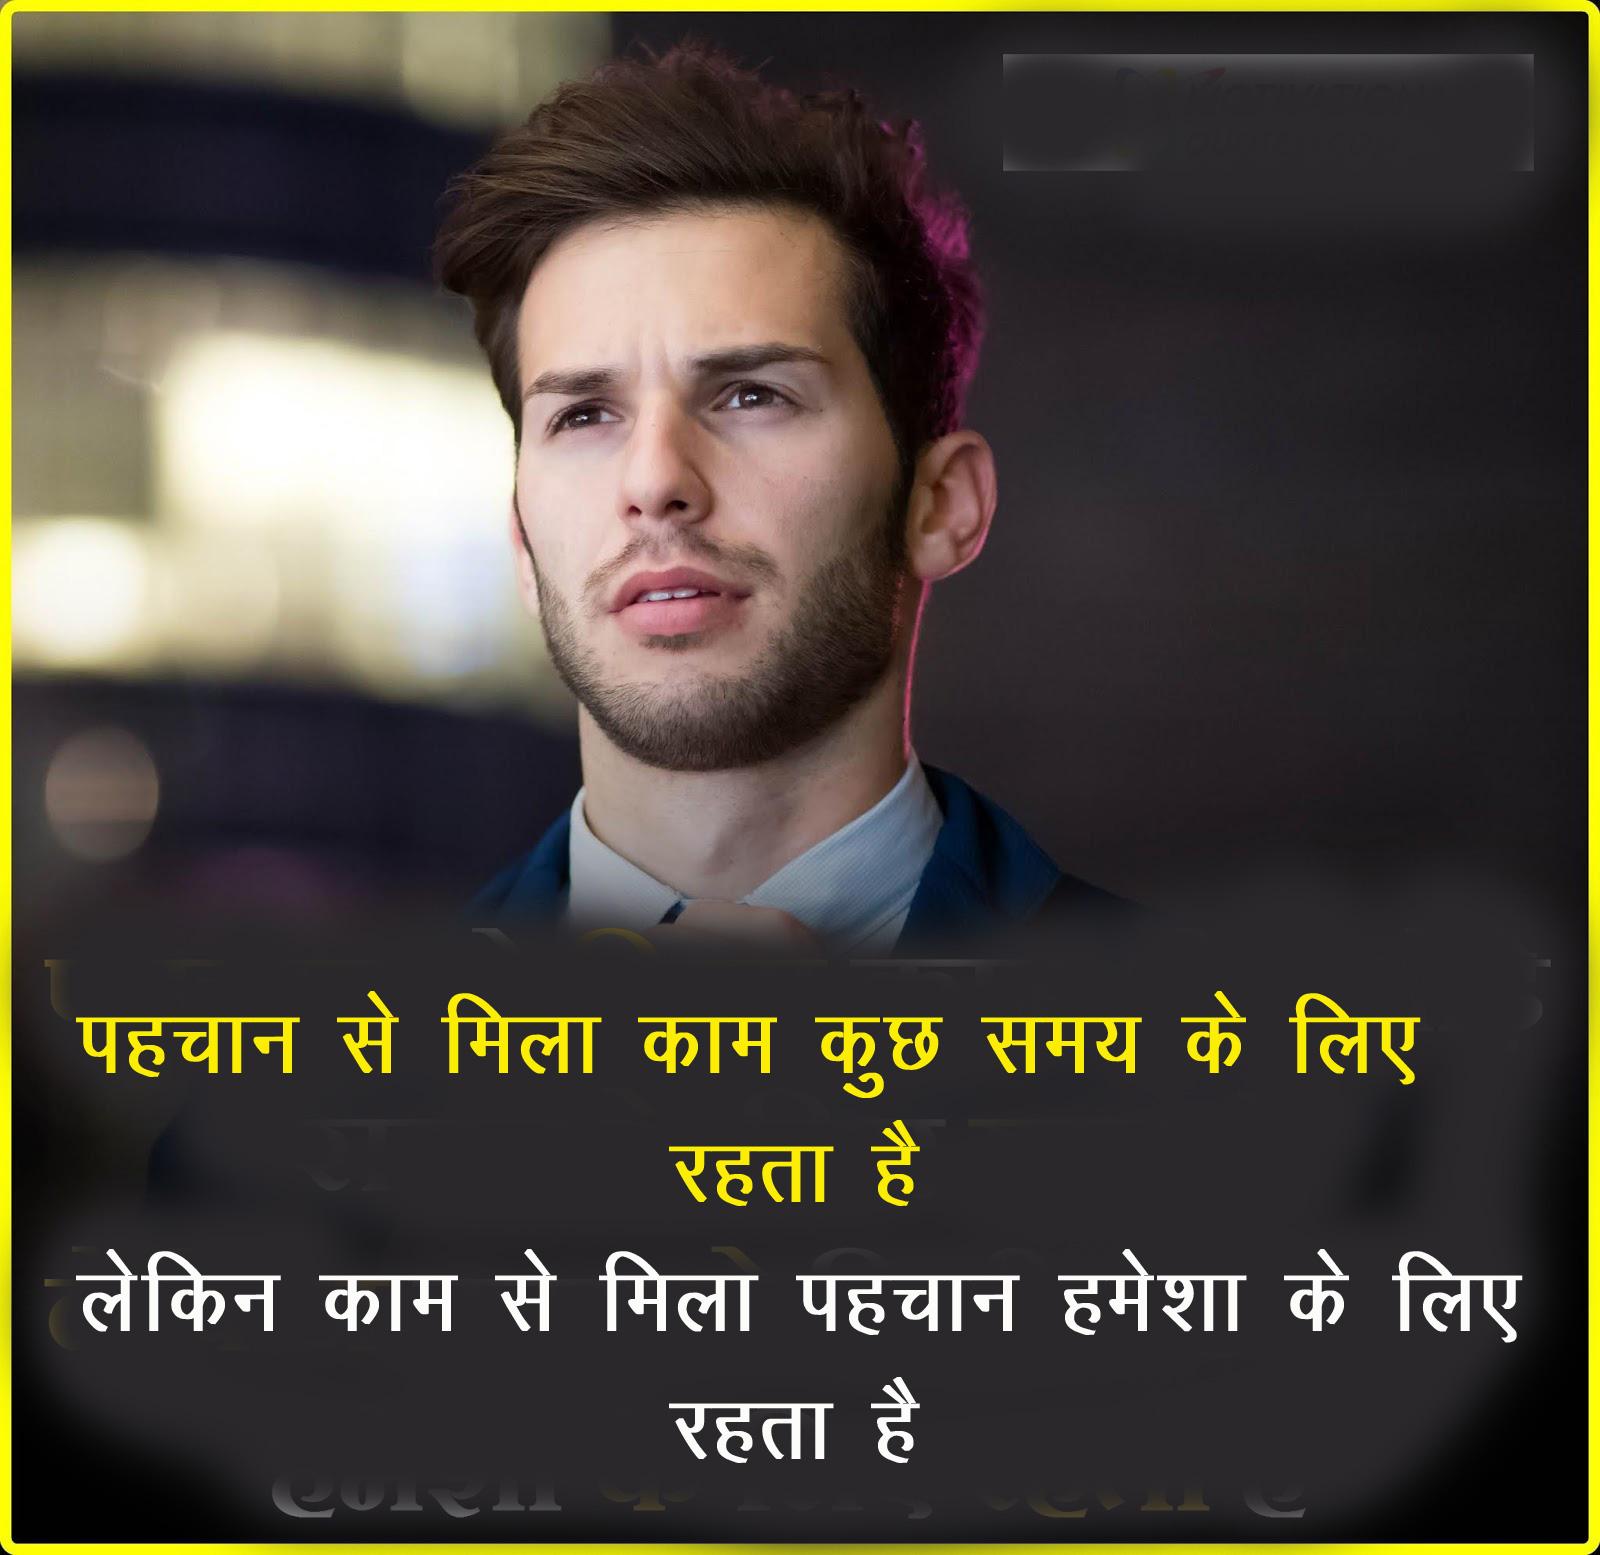 Beautiful Free Hindi Inspirational Images Pics Wallpaper Download